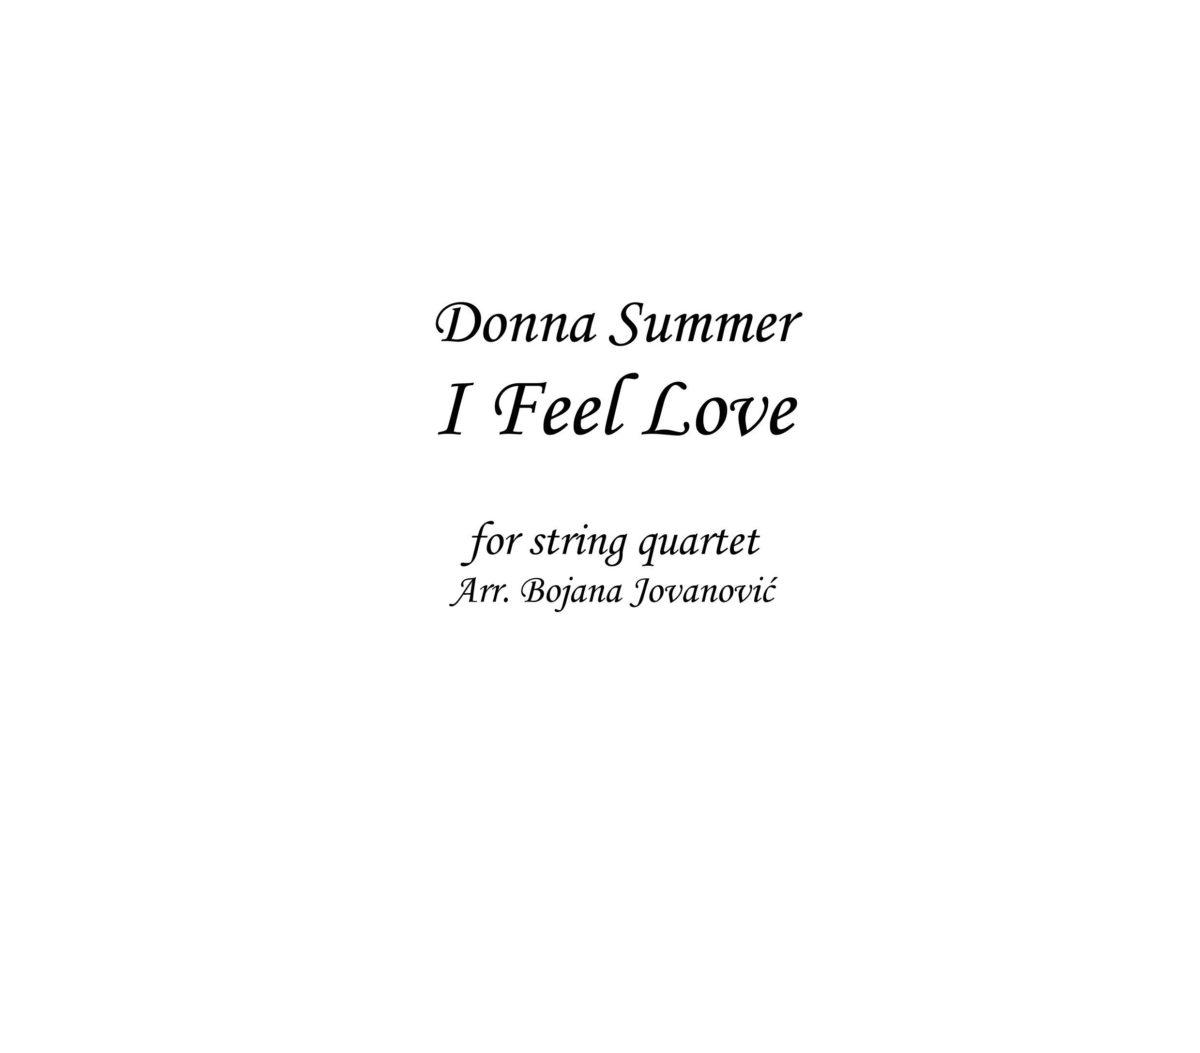 I feel love (Donna Summer) - Sheet Music